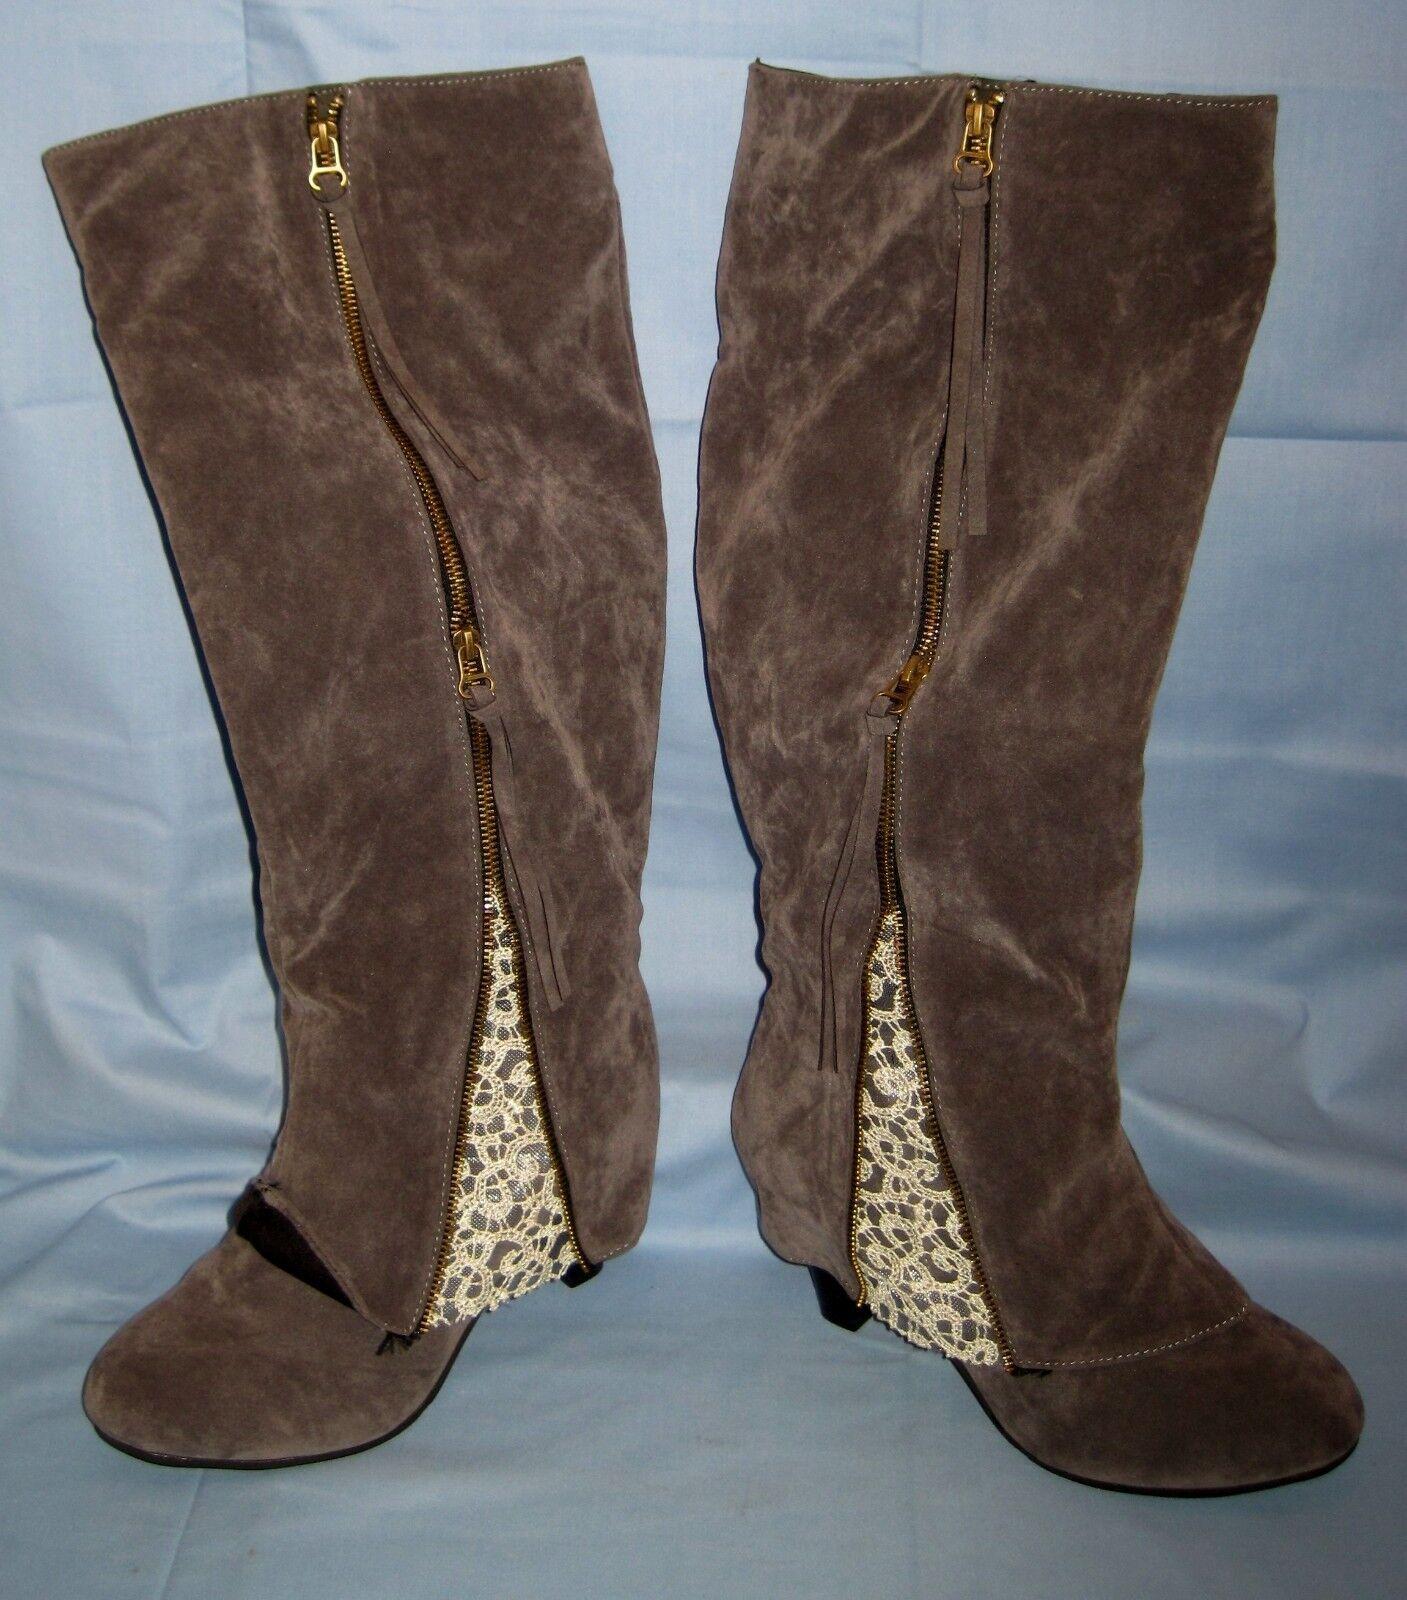 Women's Faux Suede/Gray W/Lace/Zipper Pockets Size 42 7 1/2 - 8 BOOTS!